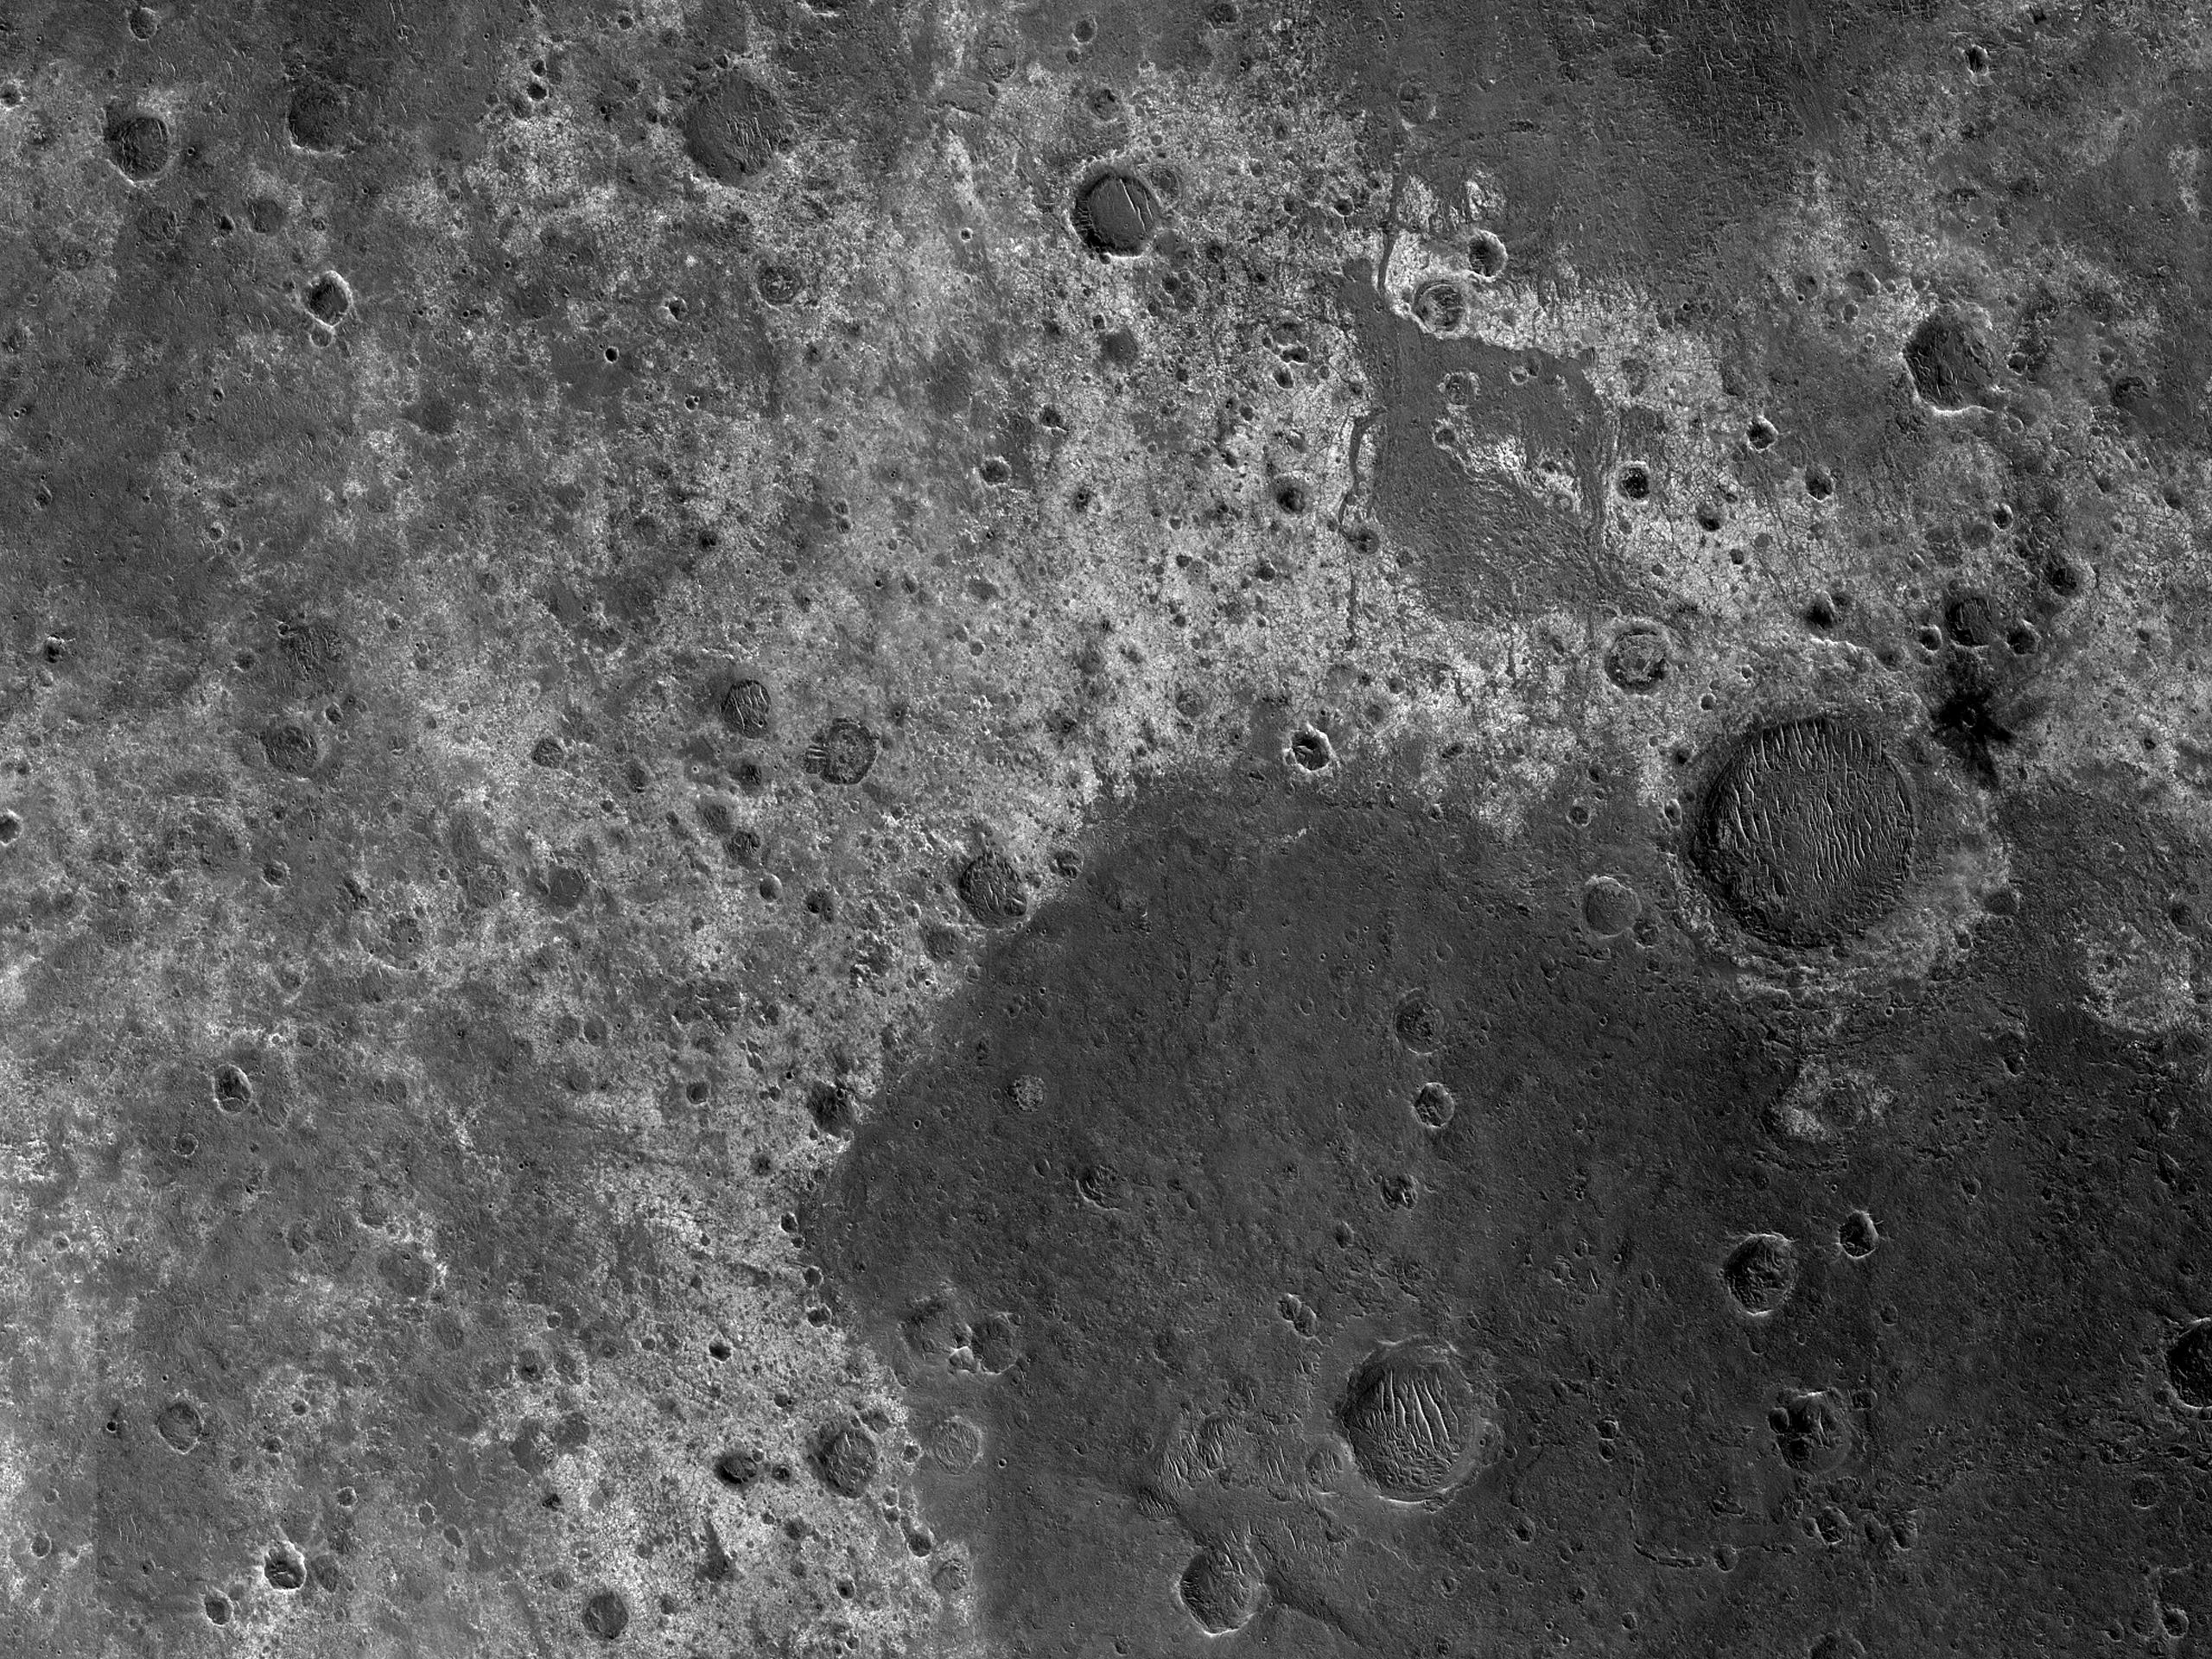 Light and Dark Units Southwest of Eos Chasma